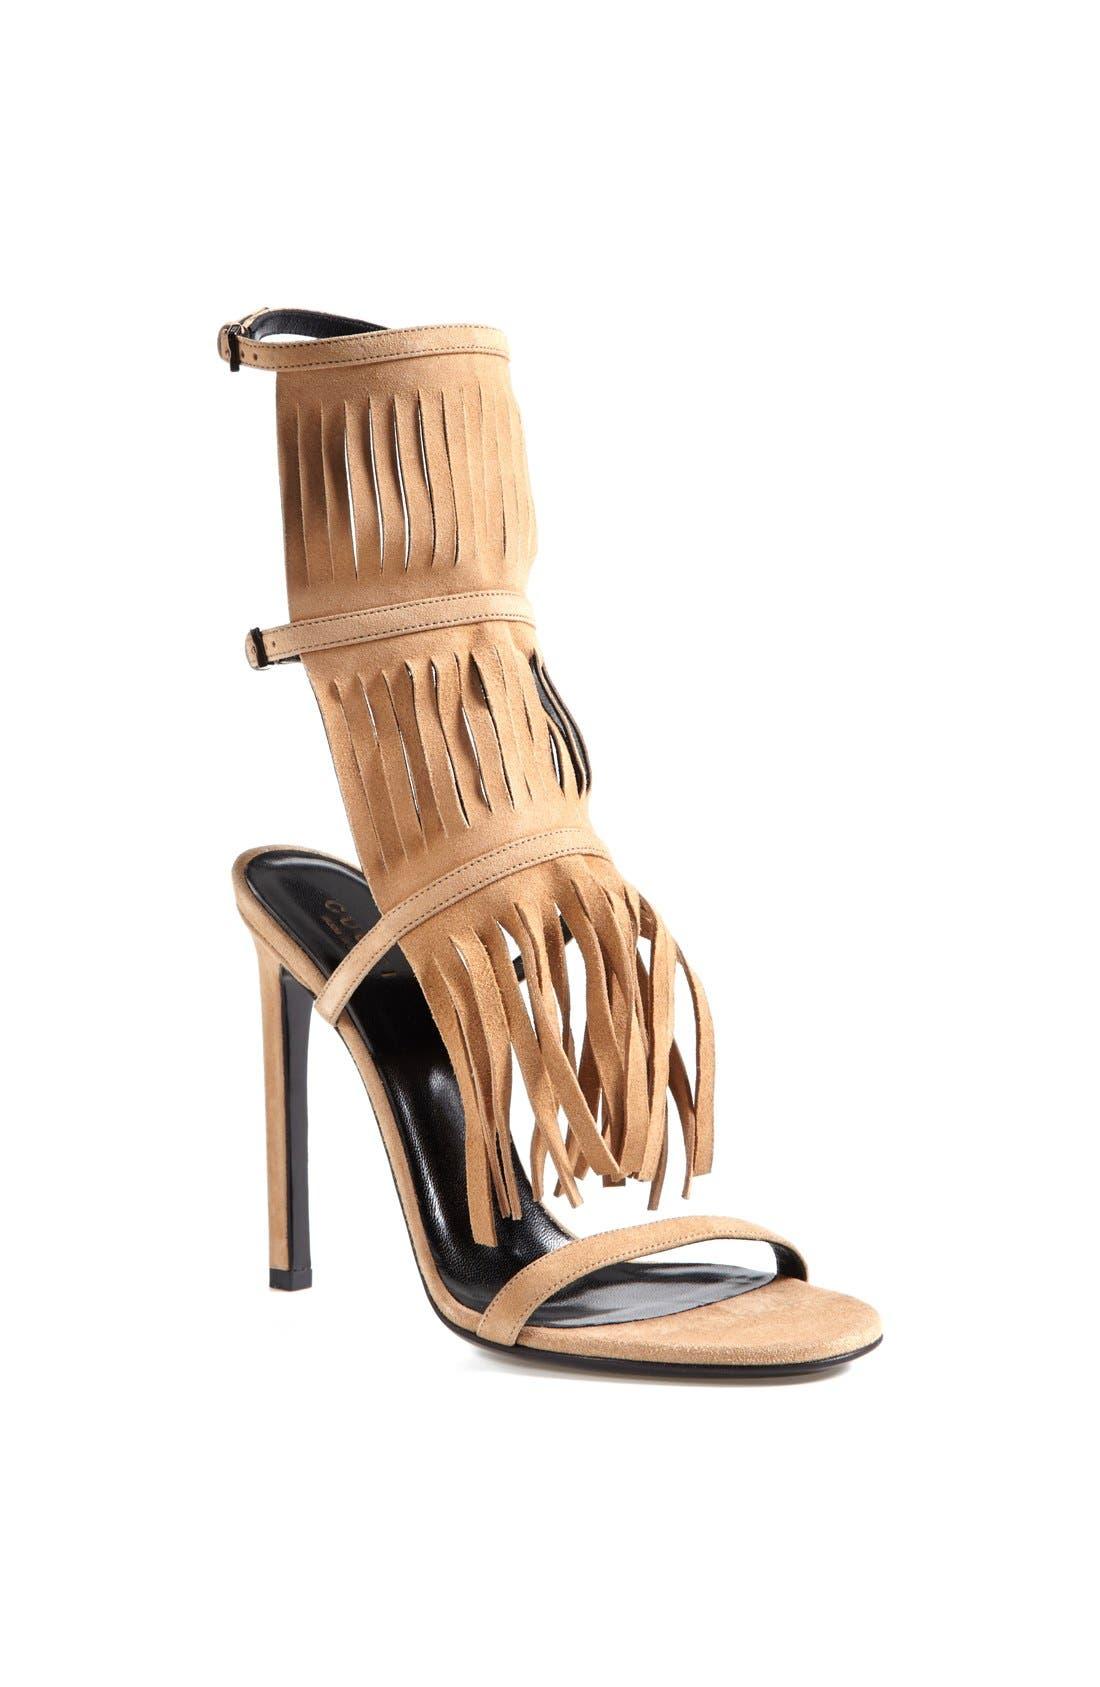 Main Image - Gucci 'Becky' Sandal